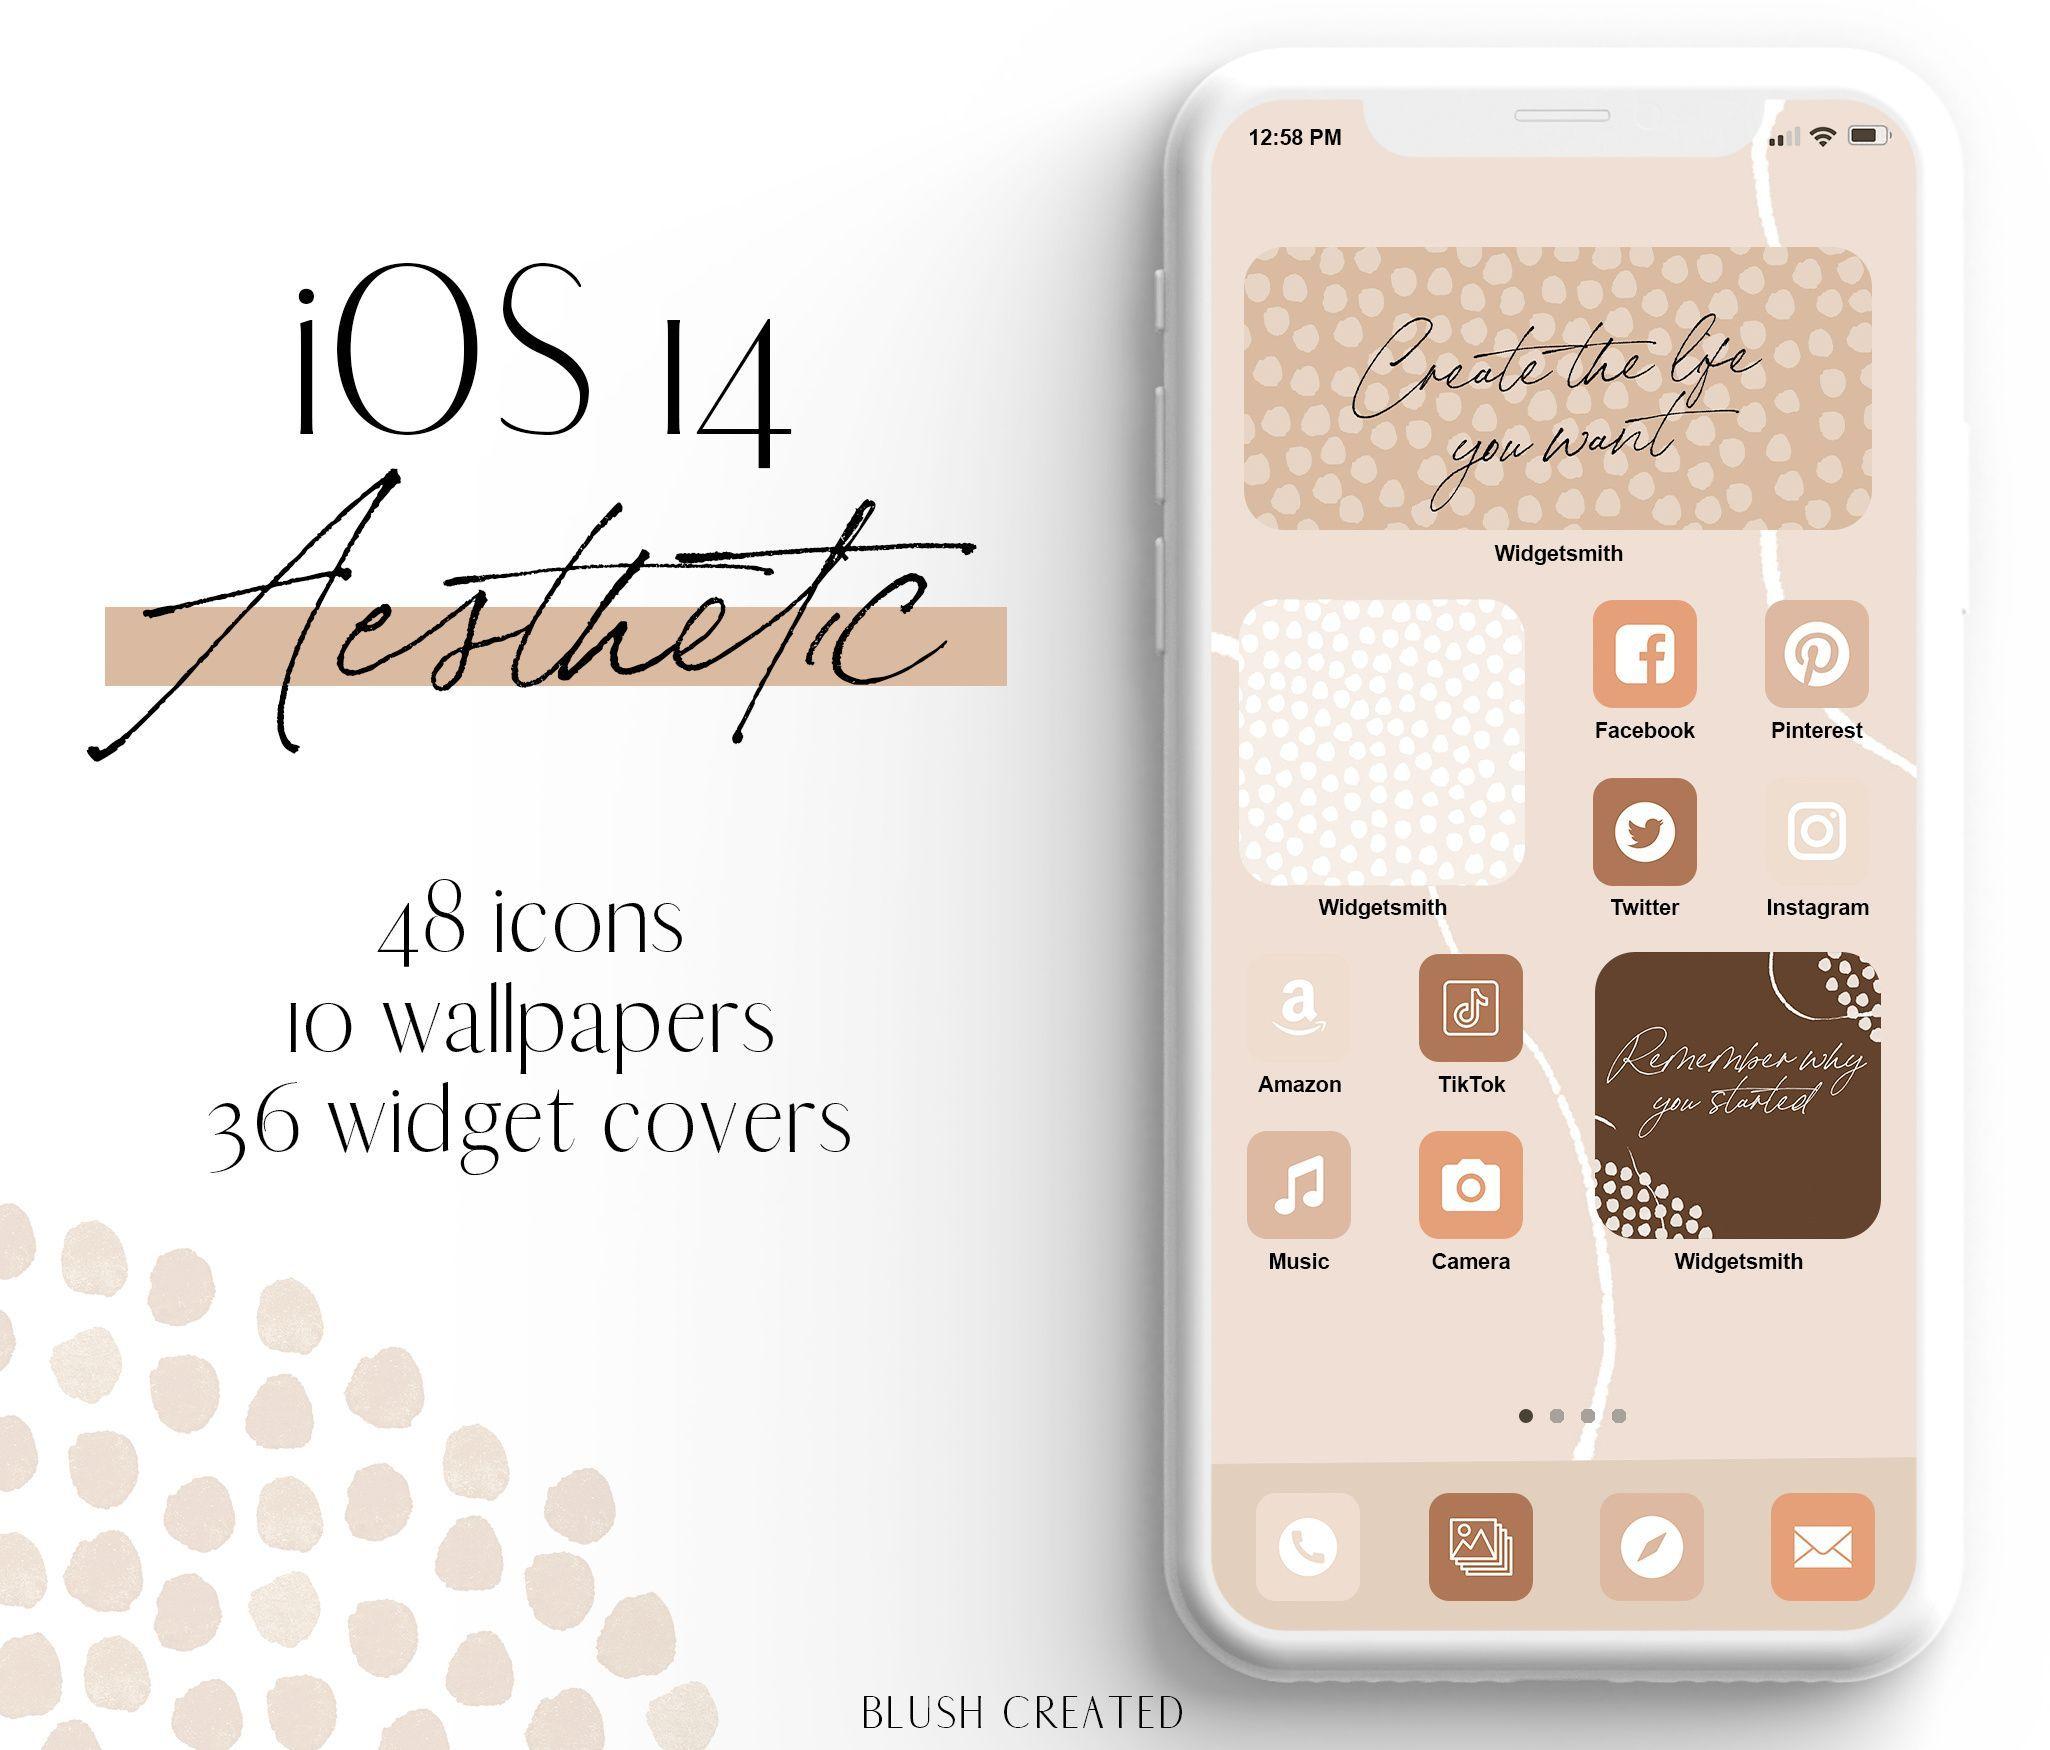 Ios 14 Aesthetic Desert Iphone App Icons Blush Created Iphone App Design Iphone Design Homescreen